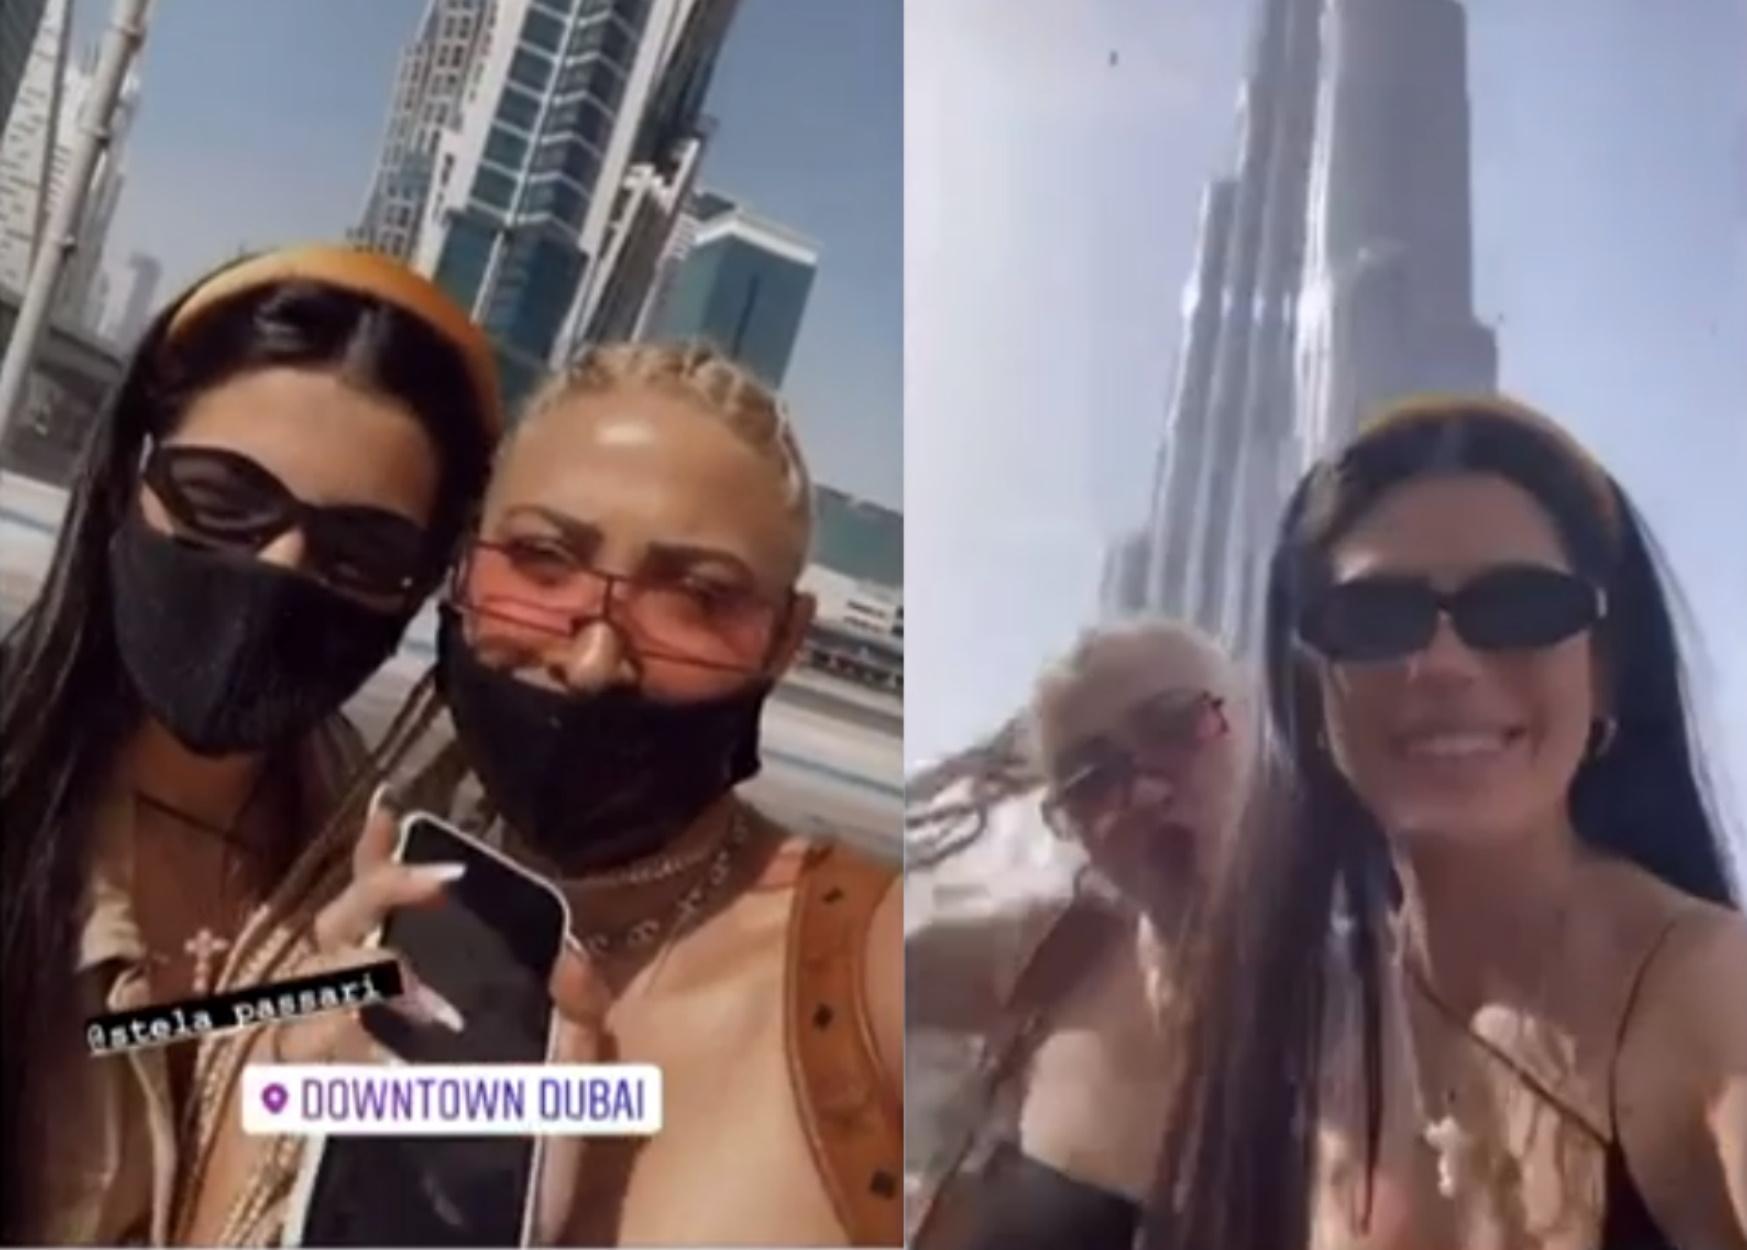 H Ιωάννα Τούνη στο Ντουμπάι με την κολλητή της